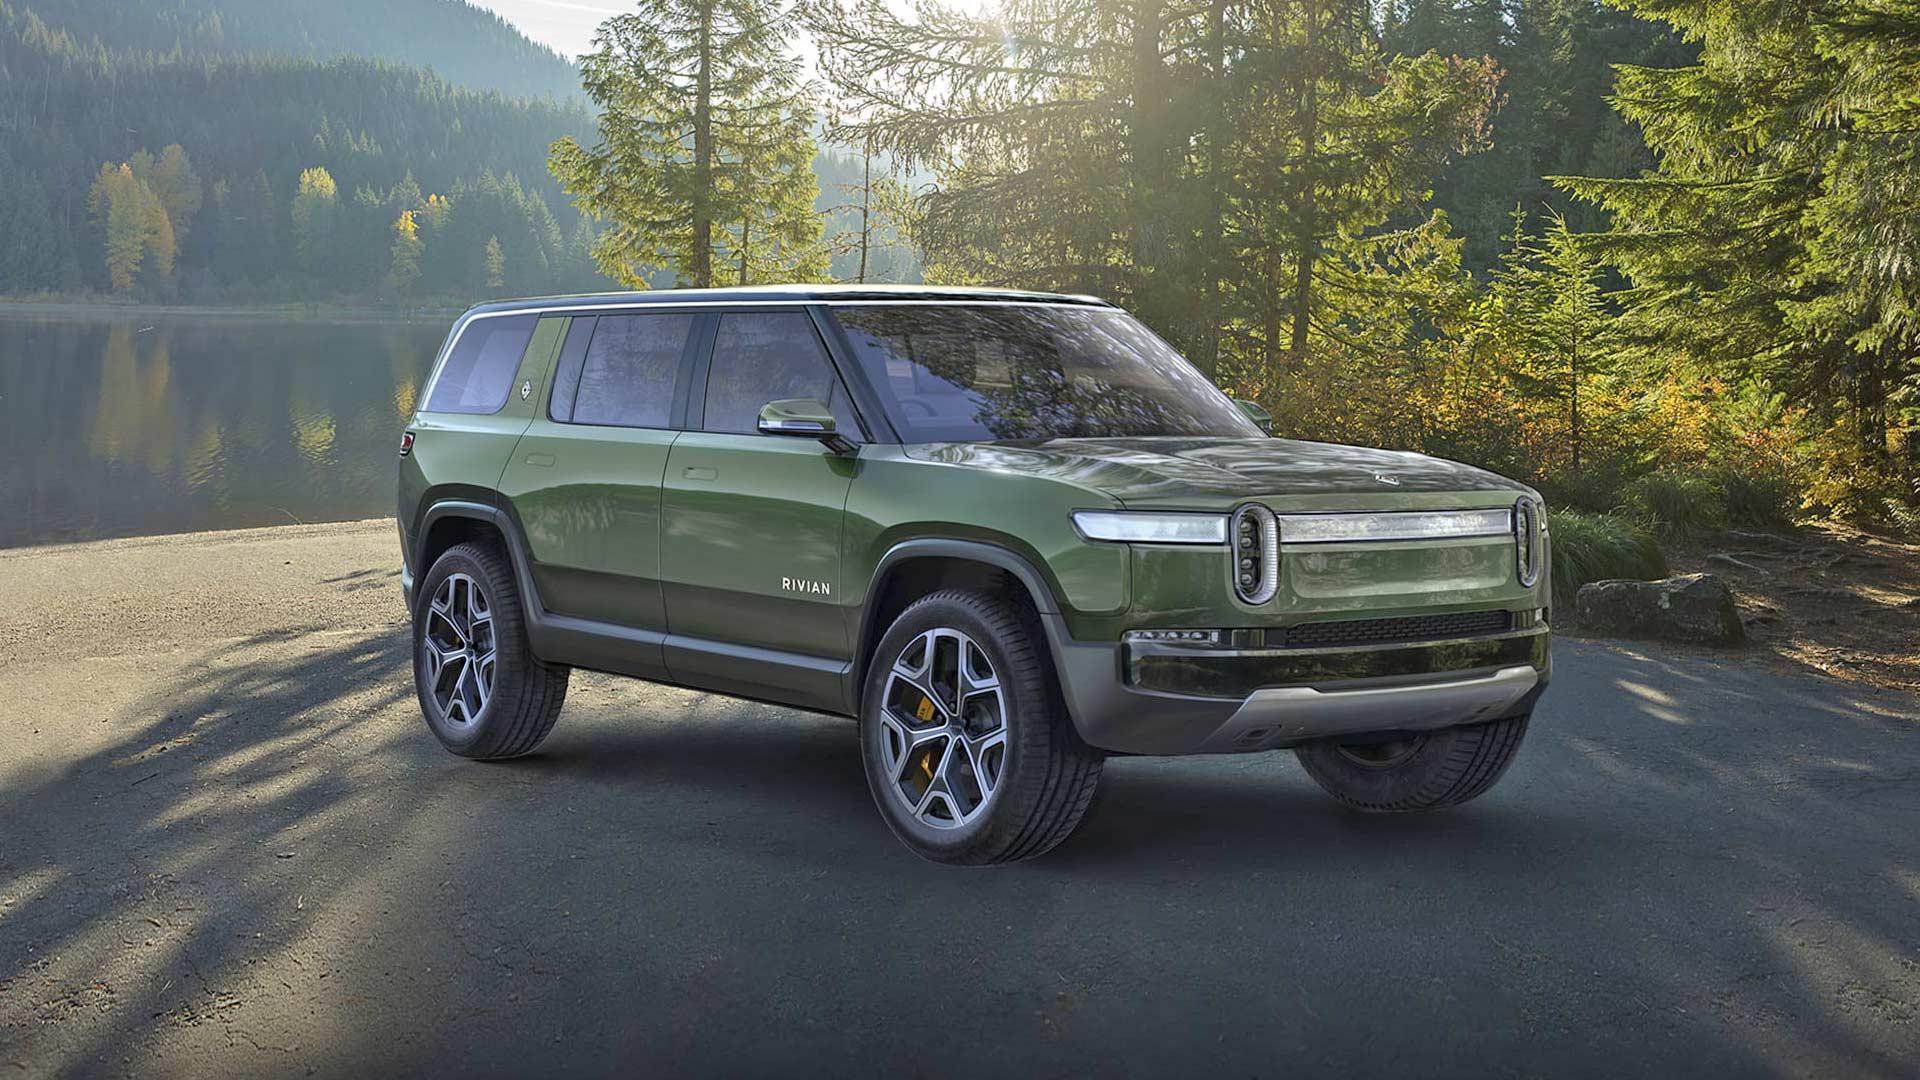 Rivian-R1S-all-electric-SUV